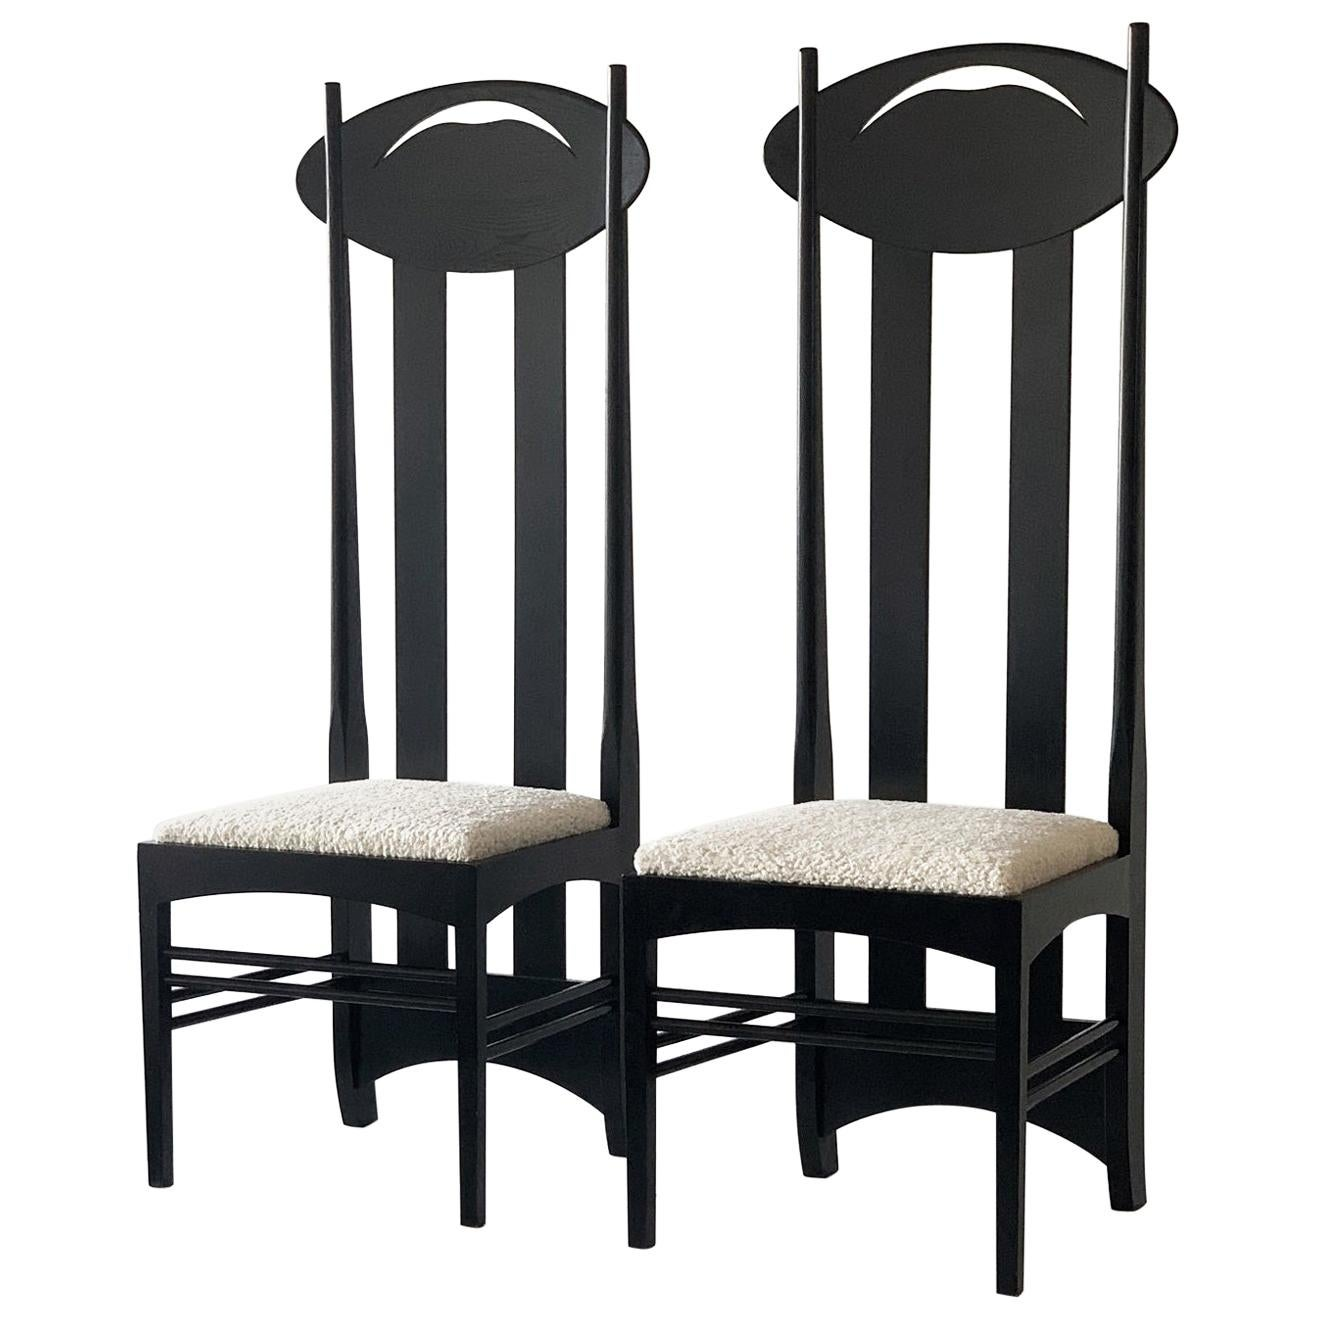 Charles Rennie Mackintosh Argyle Chairs, a Pair, Cassina, 1970's